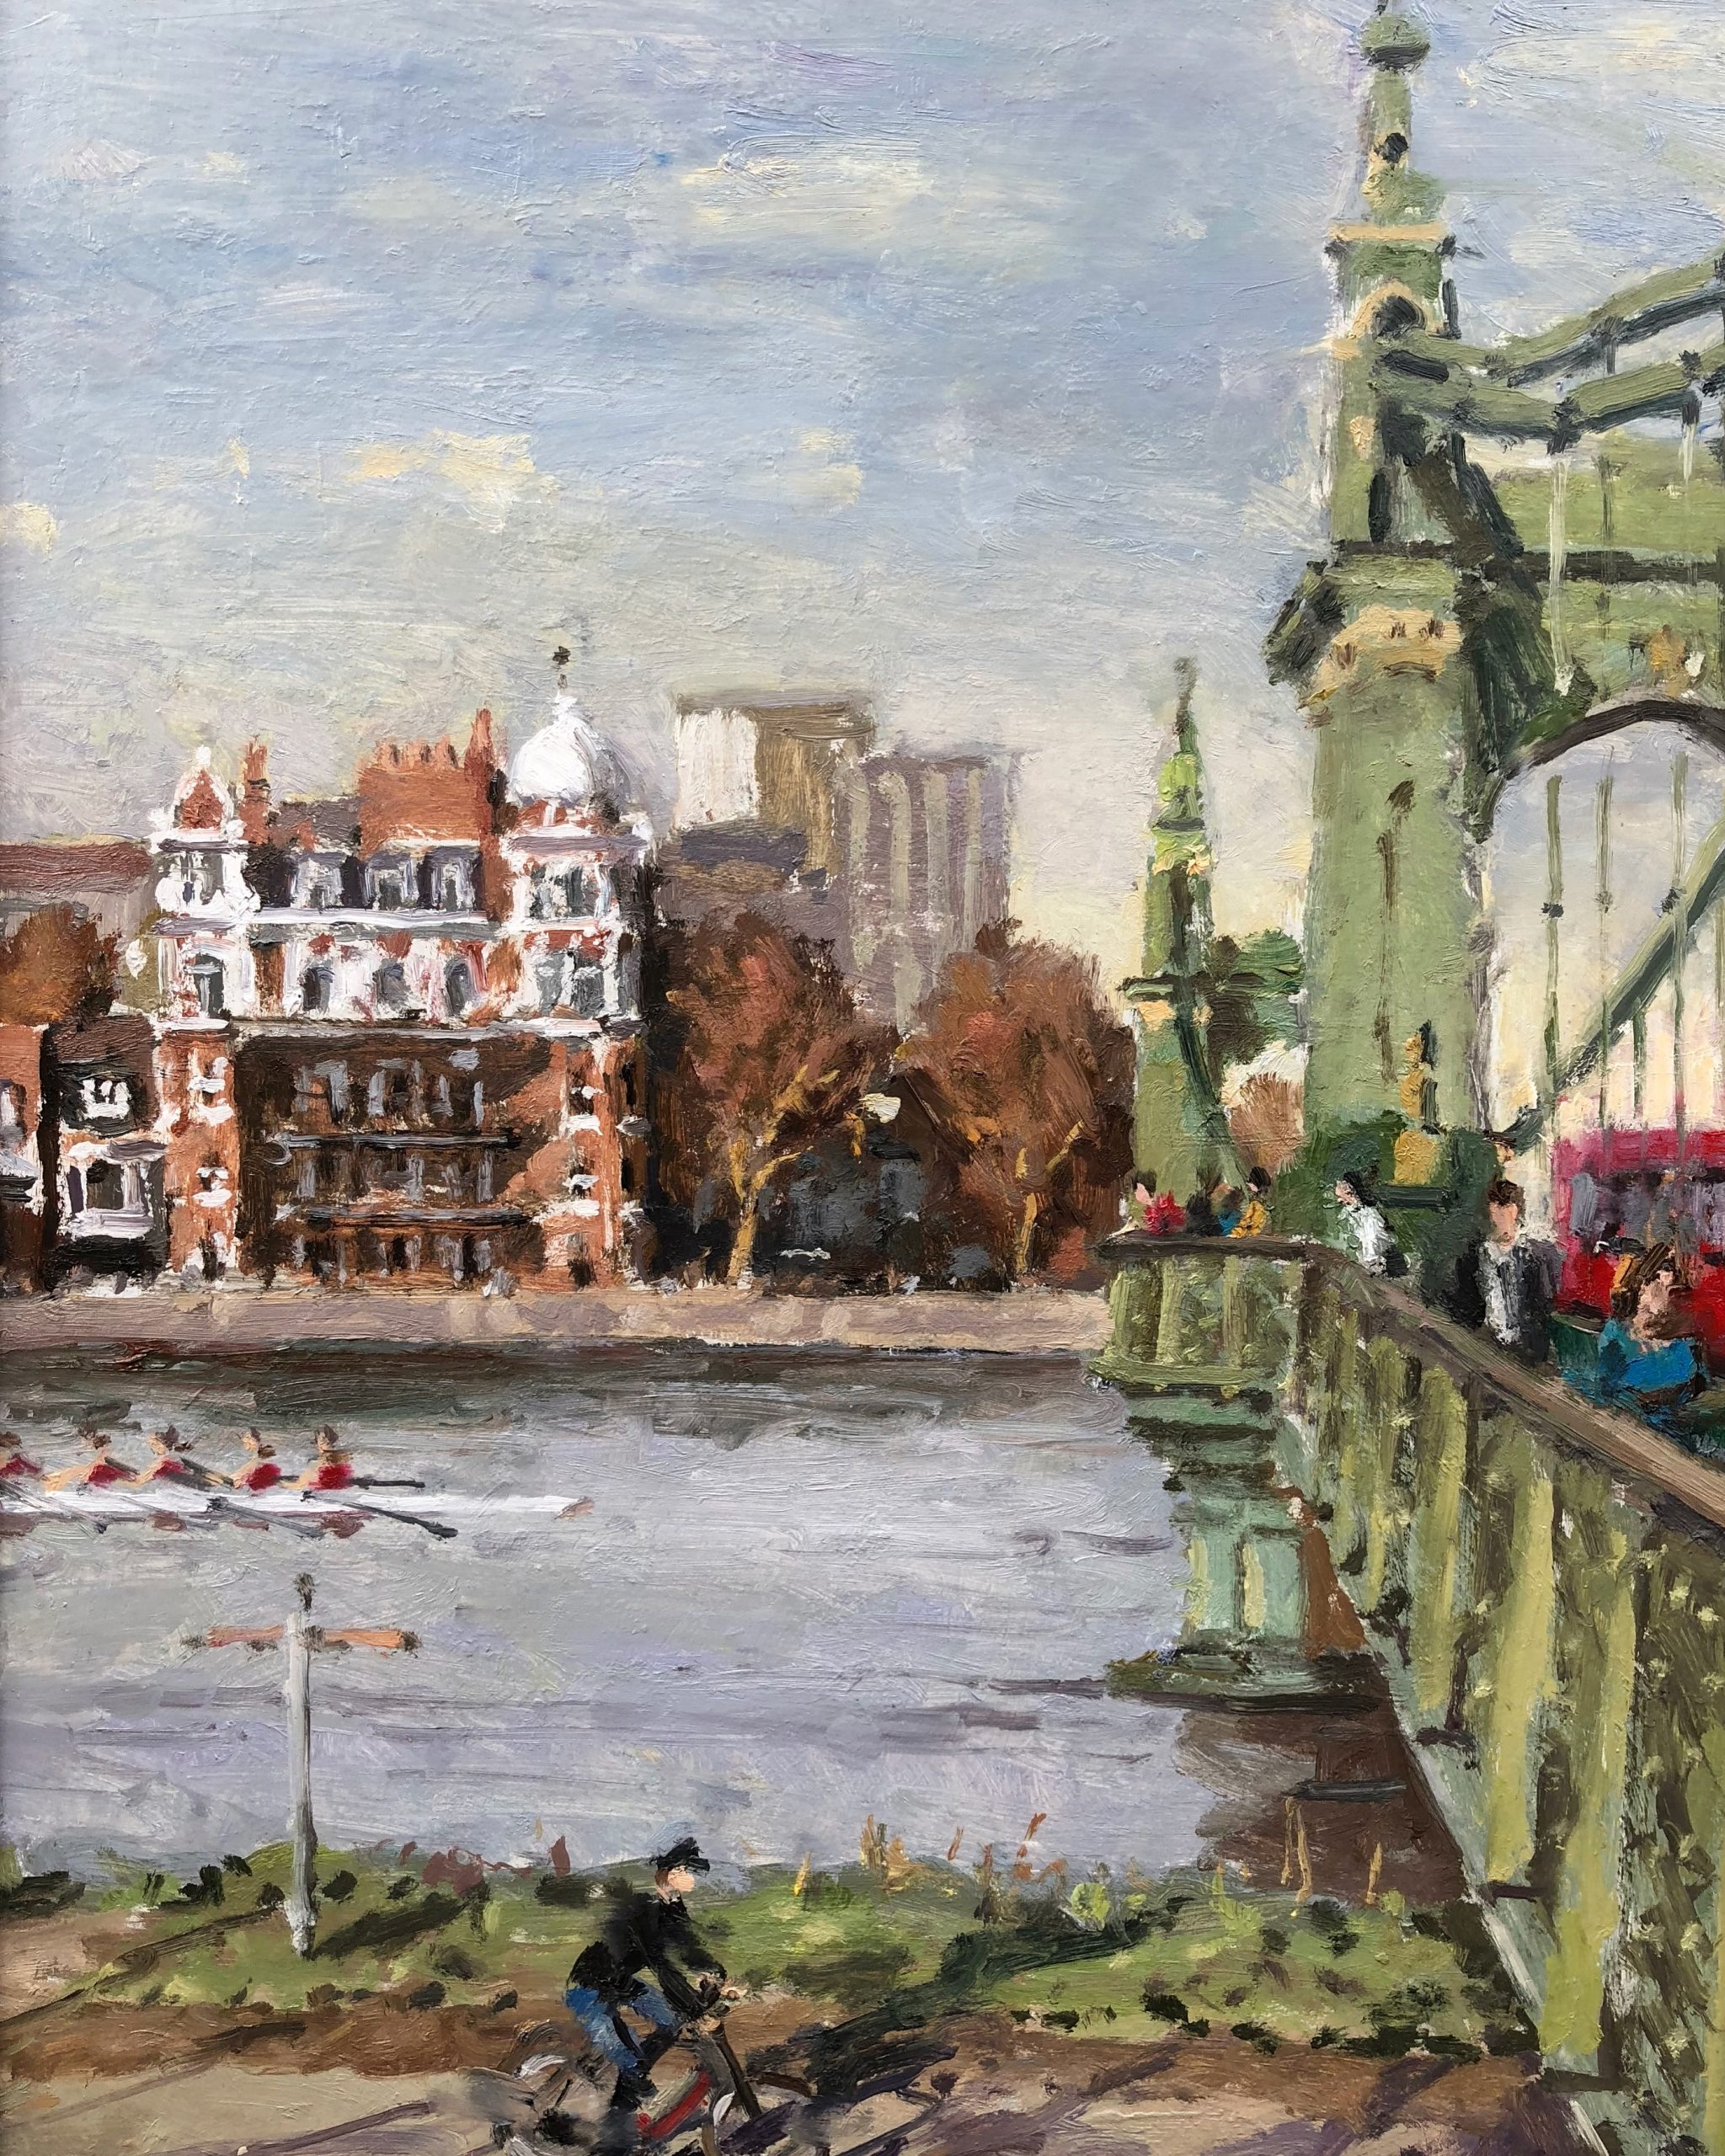 Hammersmith Bridge by Rod Pearce